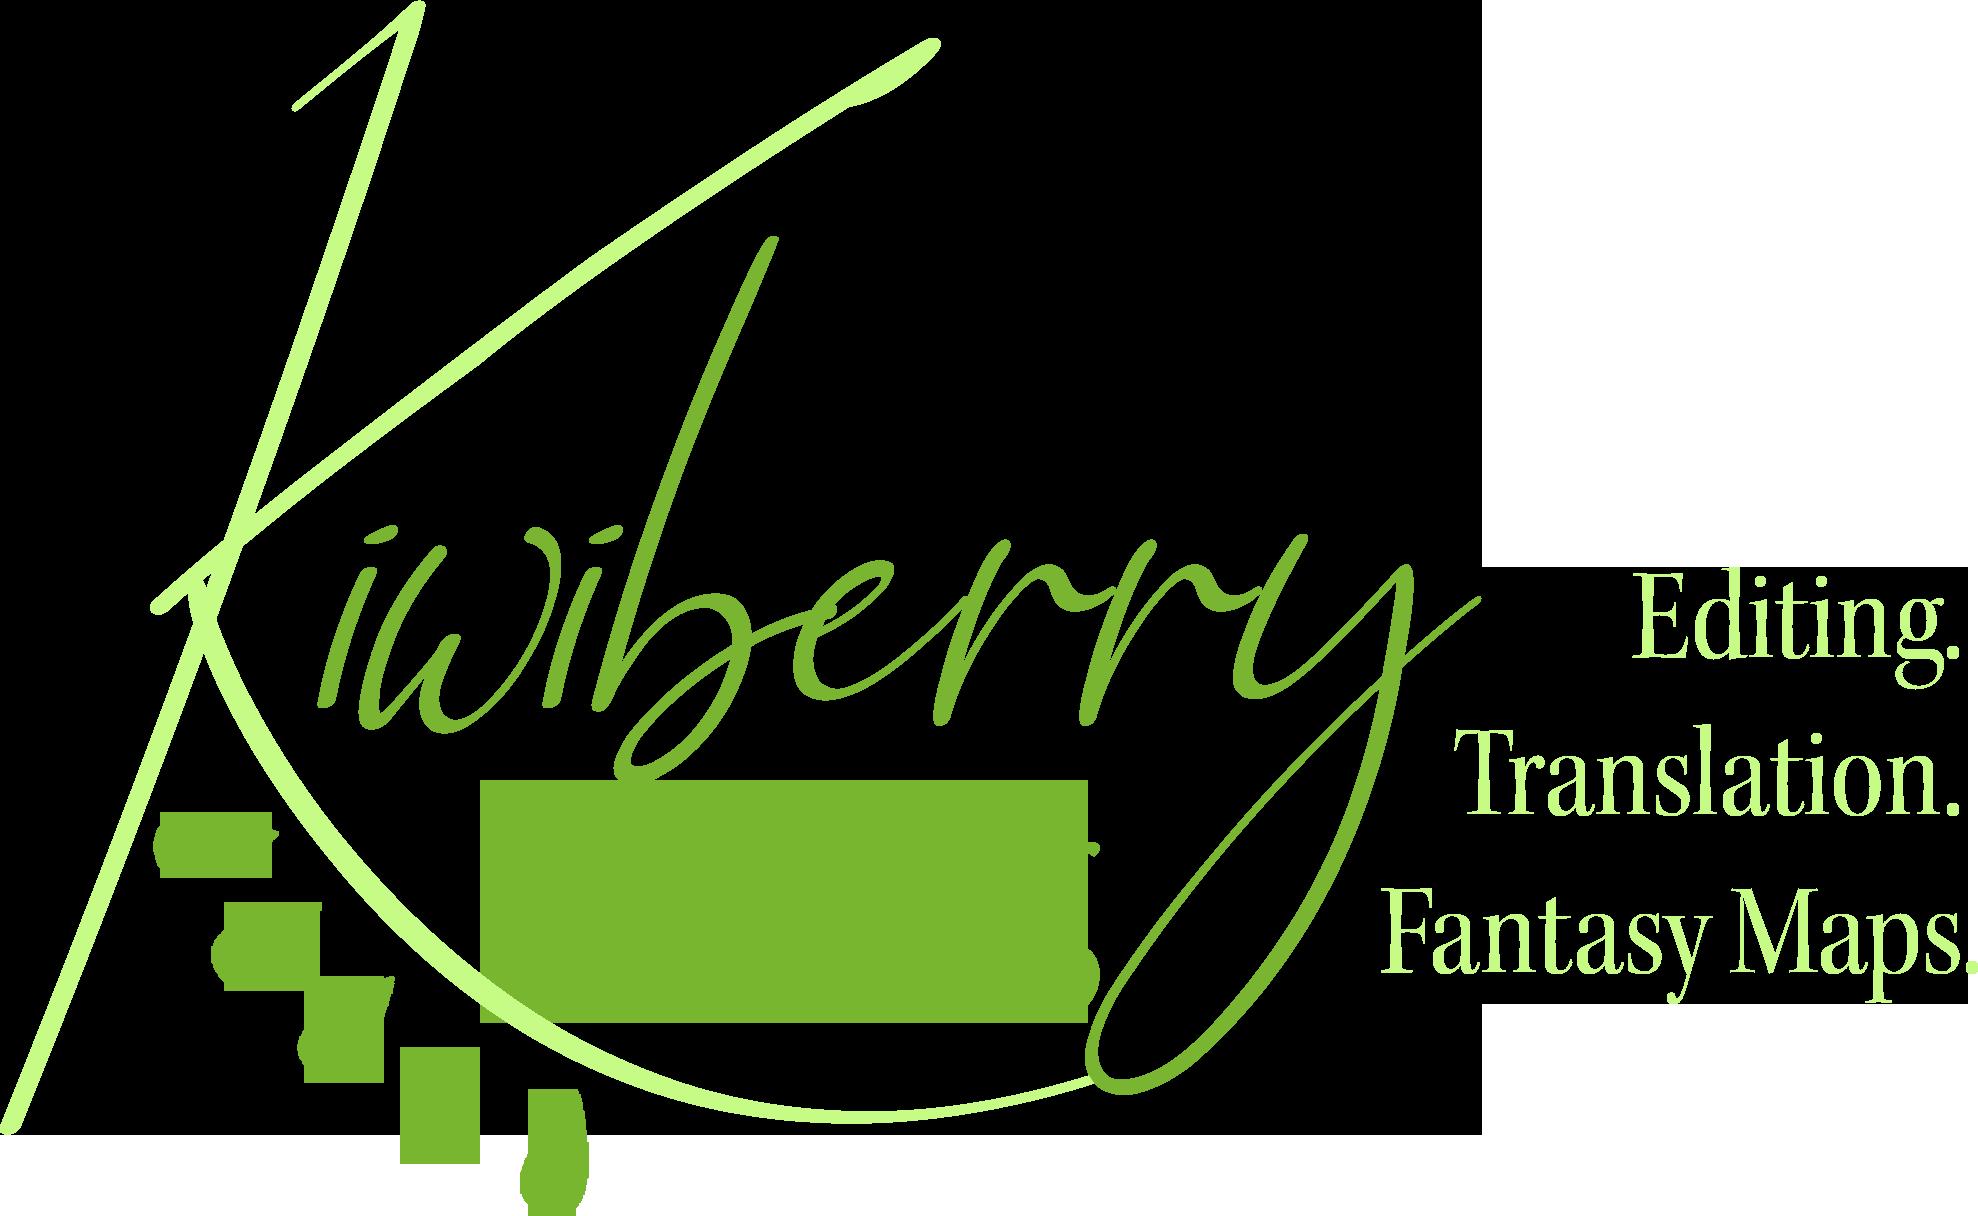 kiwi editing logo mit text hell